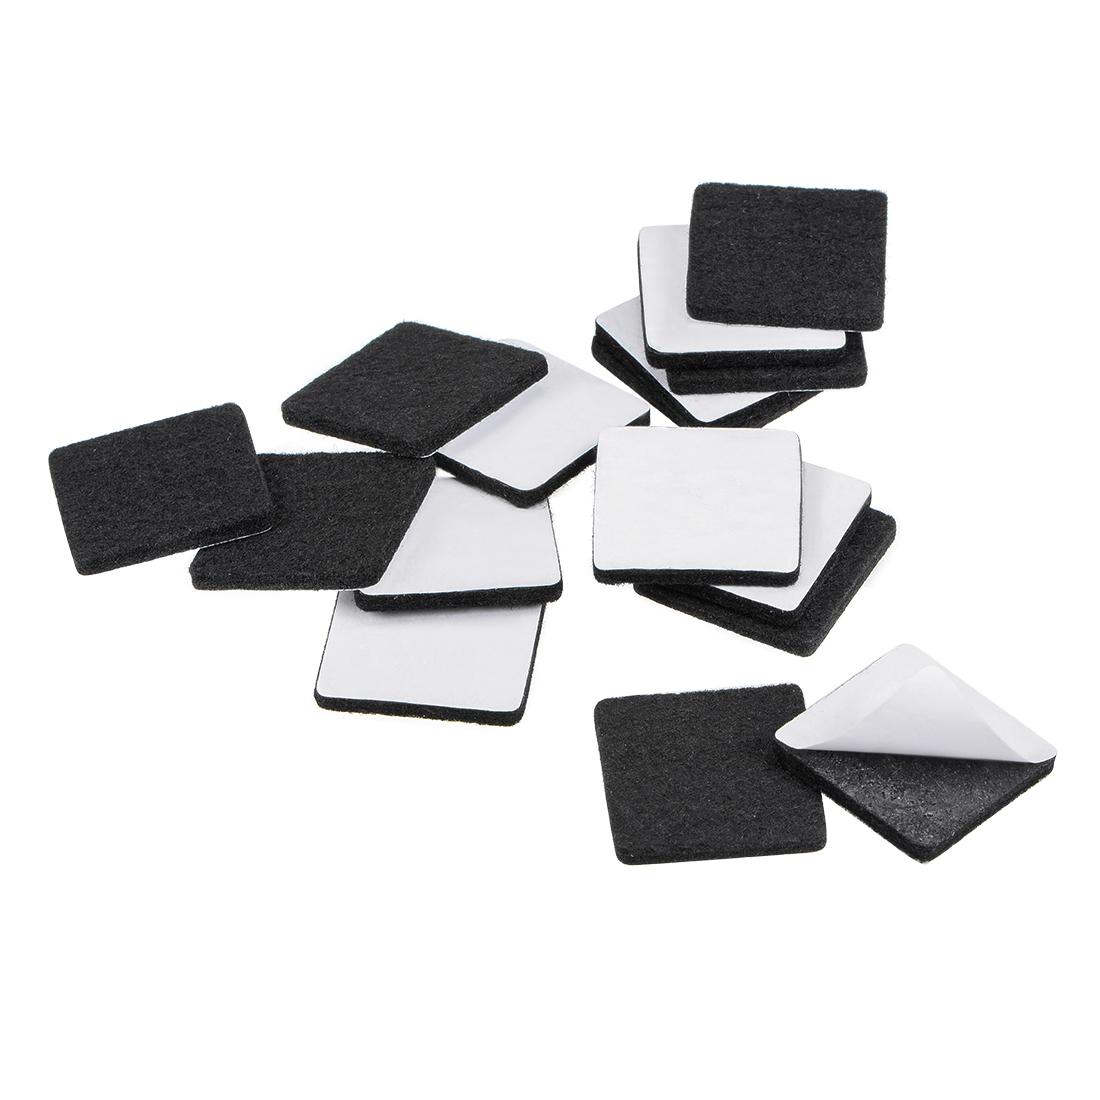 Furniture Pads Adhesive Felt Pads 30mm x 30mm Square 3mm Thick Black 36Pcs